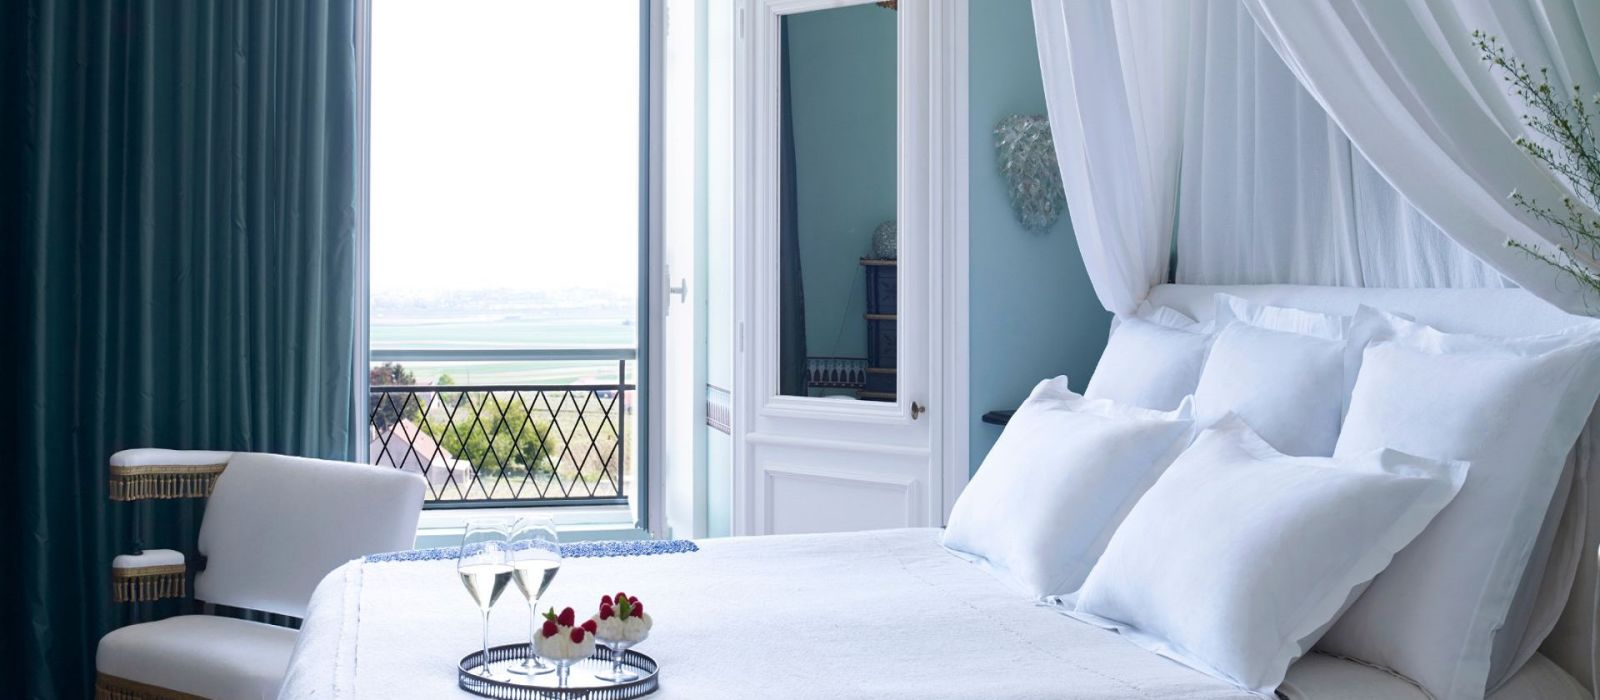 Hotel Chateau de Sacy France